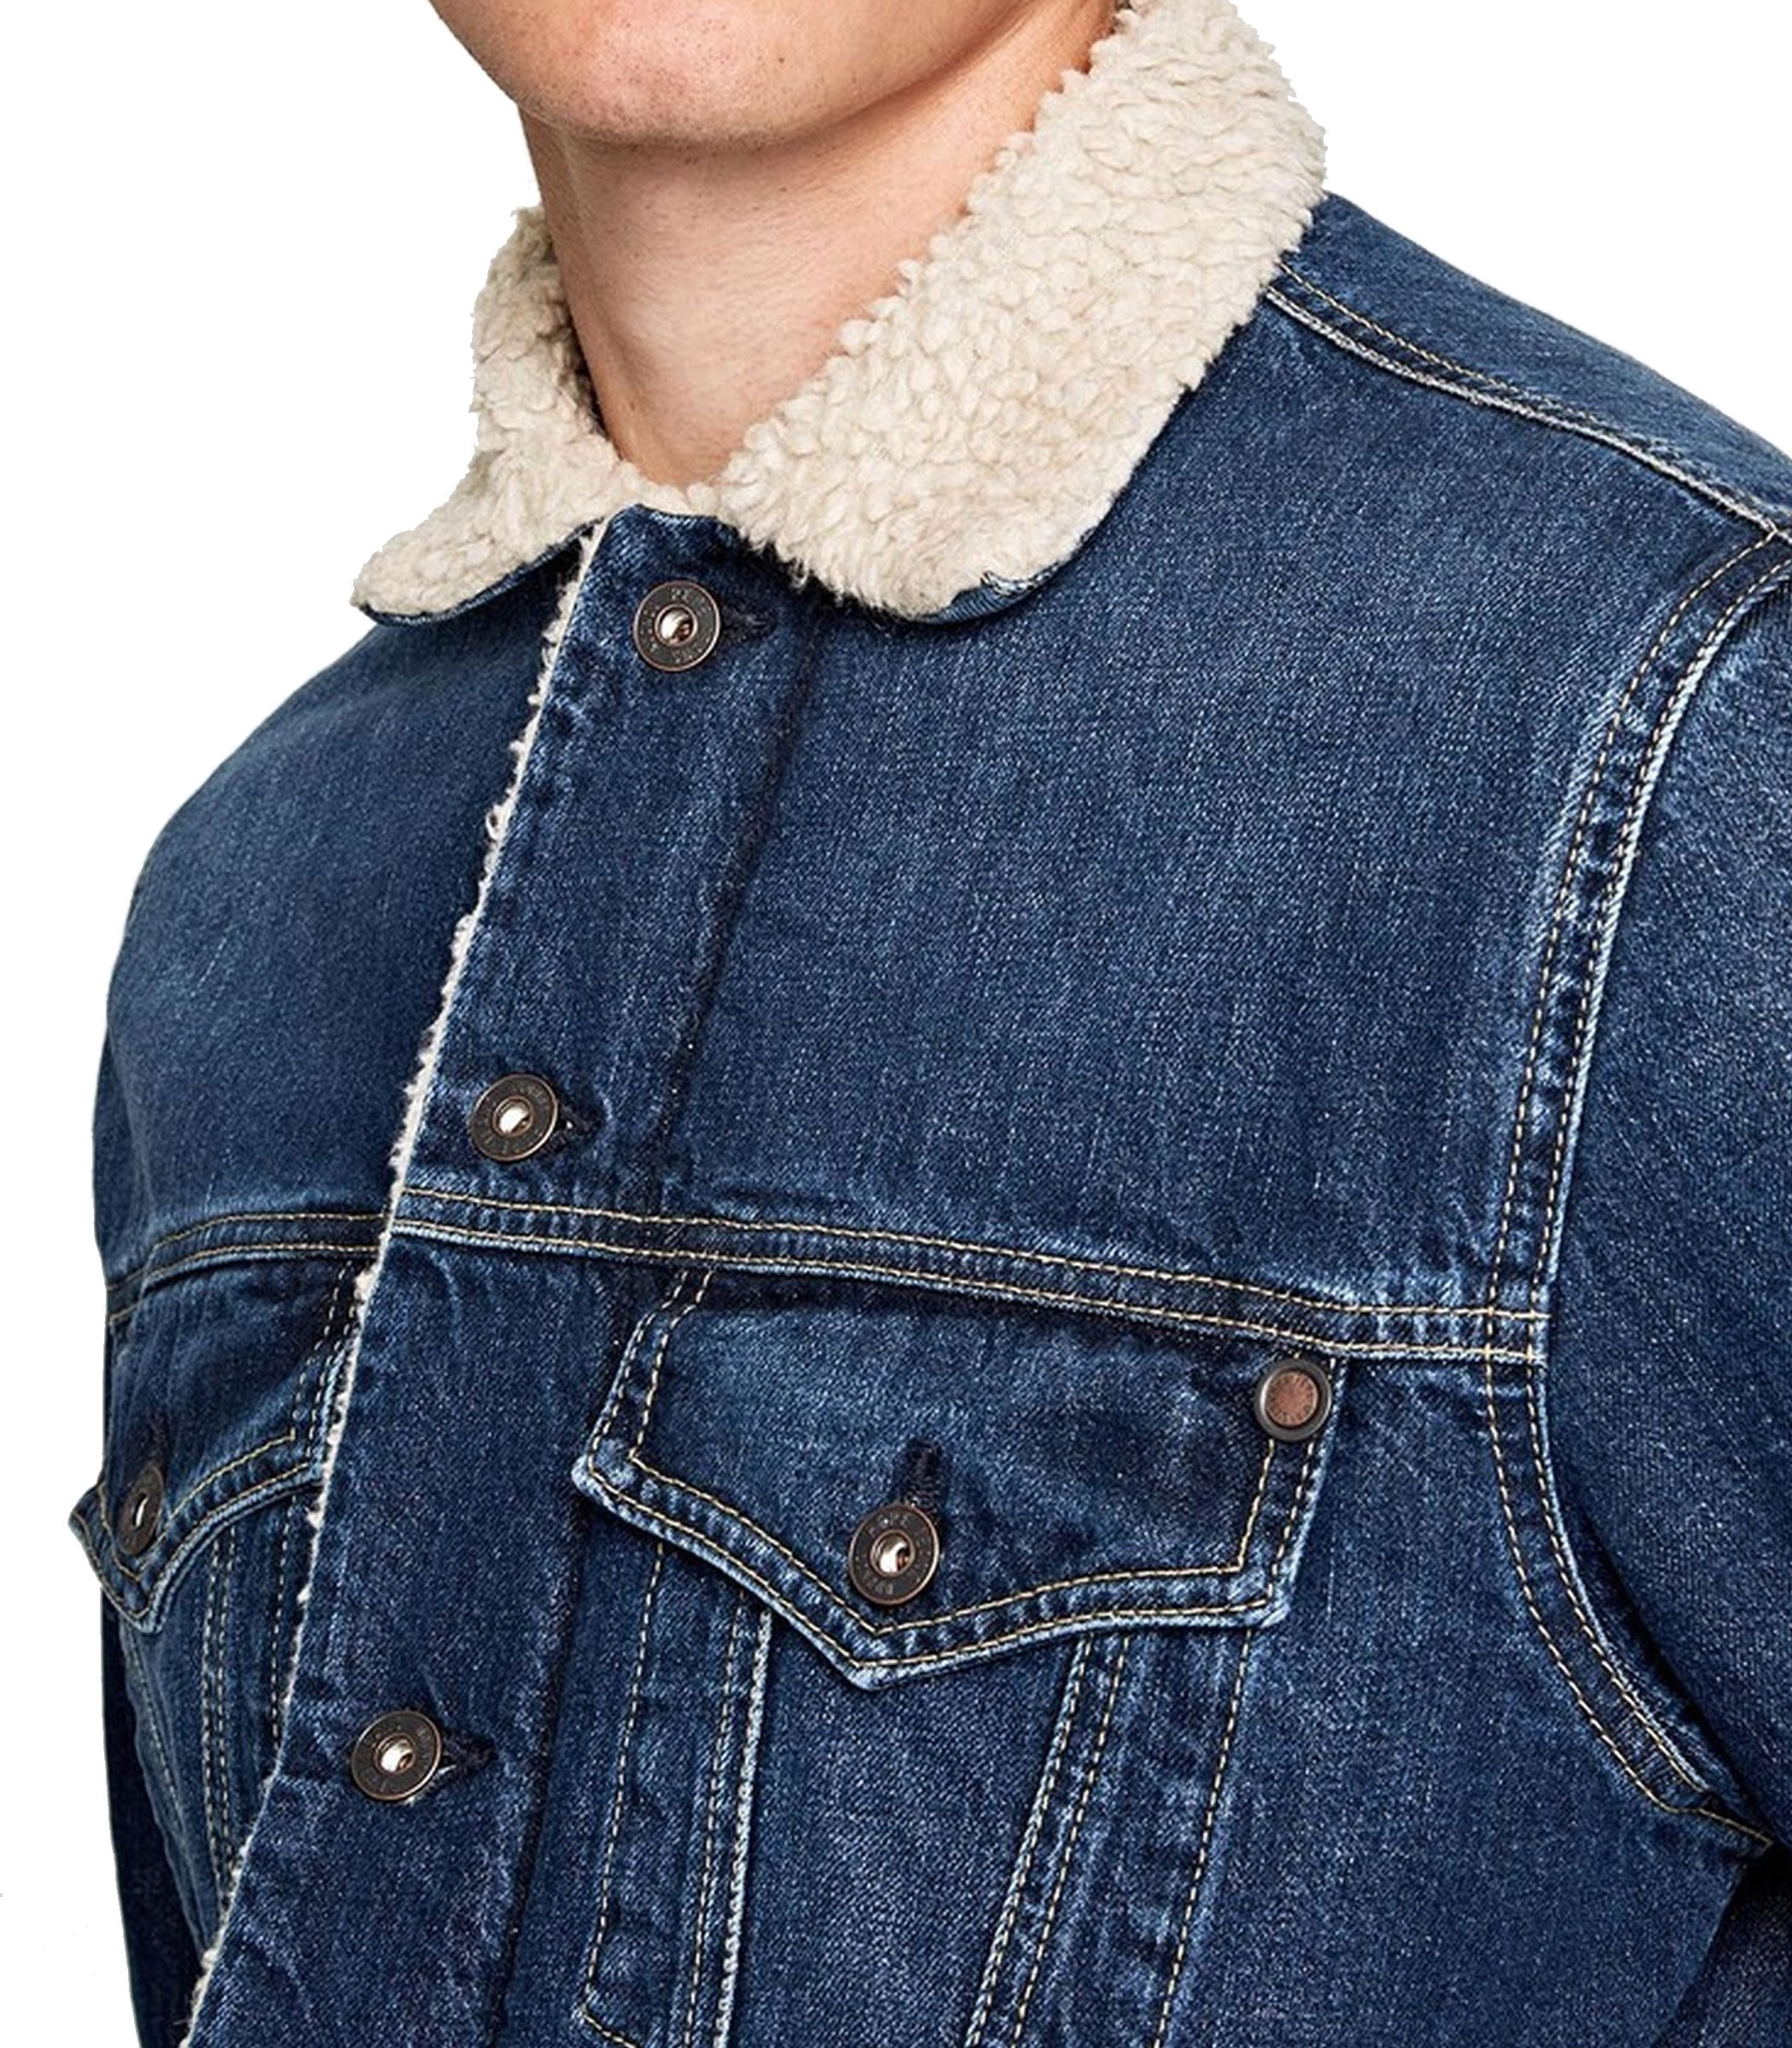 in vendita 495fe 75deb Giubbotto Giacca Pepe Jeans imbottito in tessuto denim ...